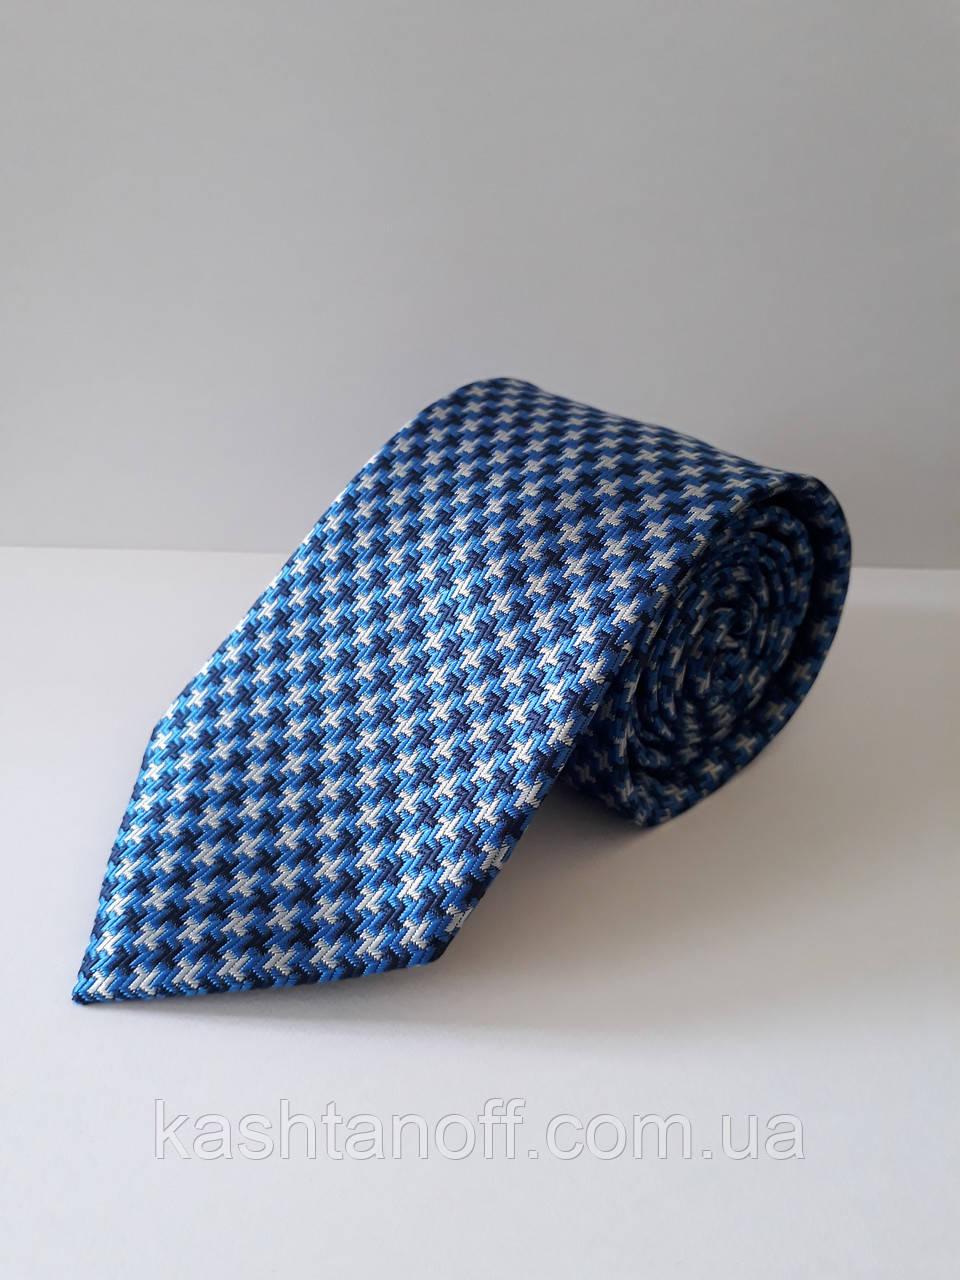 Краватка класичний блакитний з абстрактним малюнком